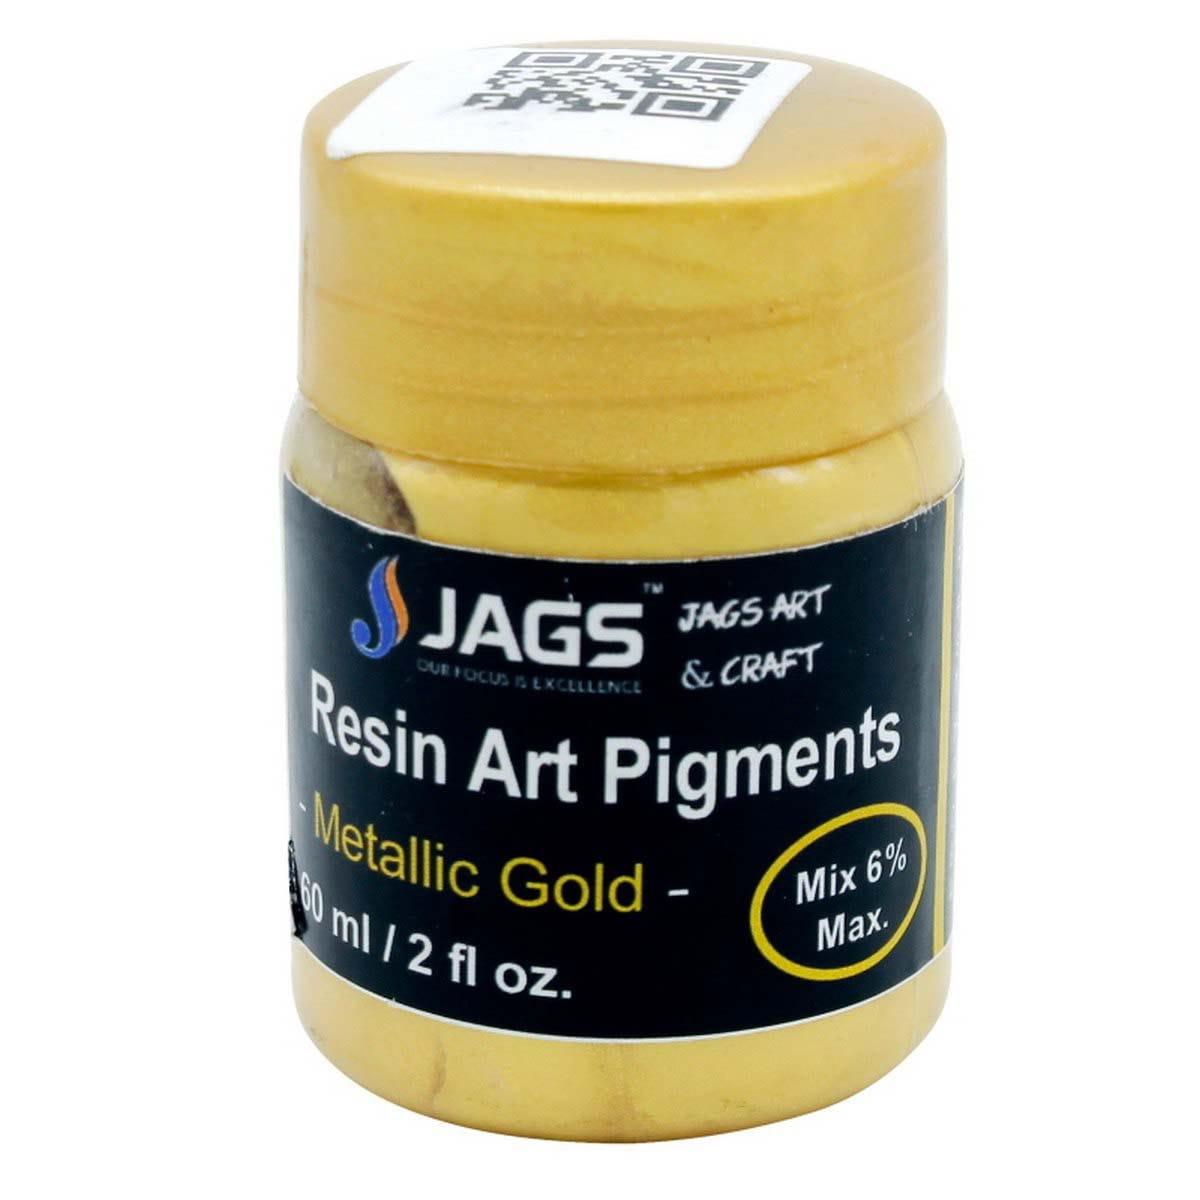 Resin Art Pigments Gold